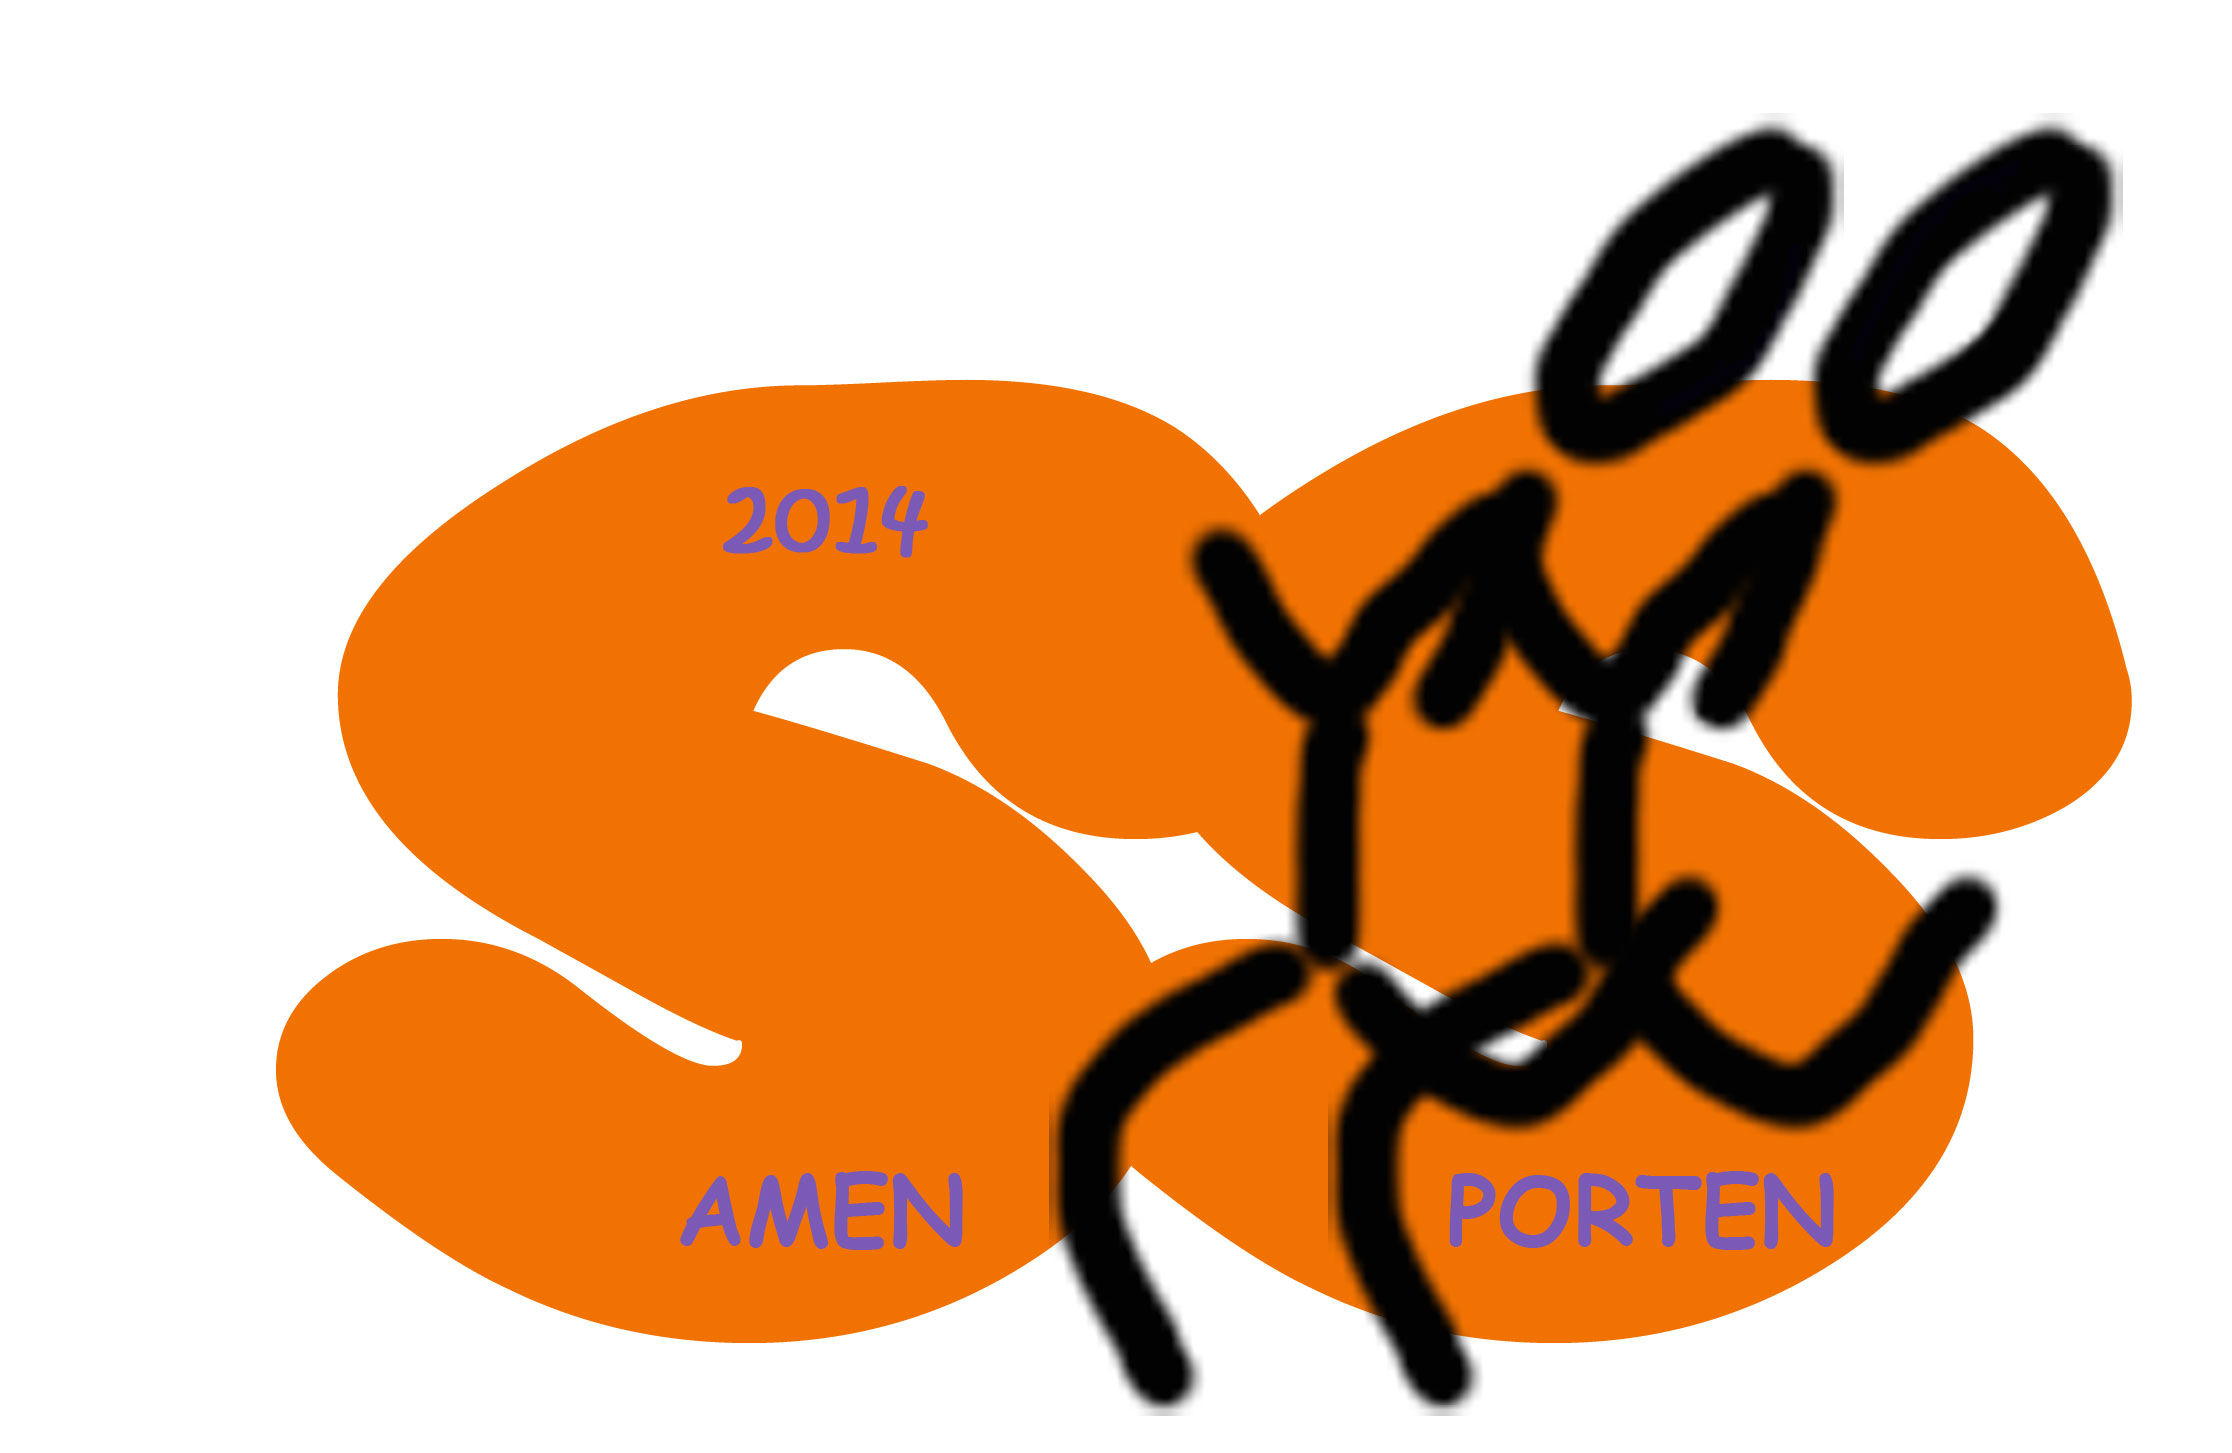 SamenSporten 2014